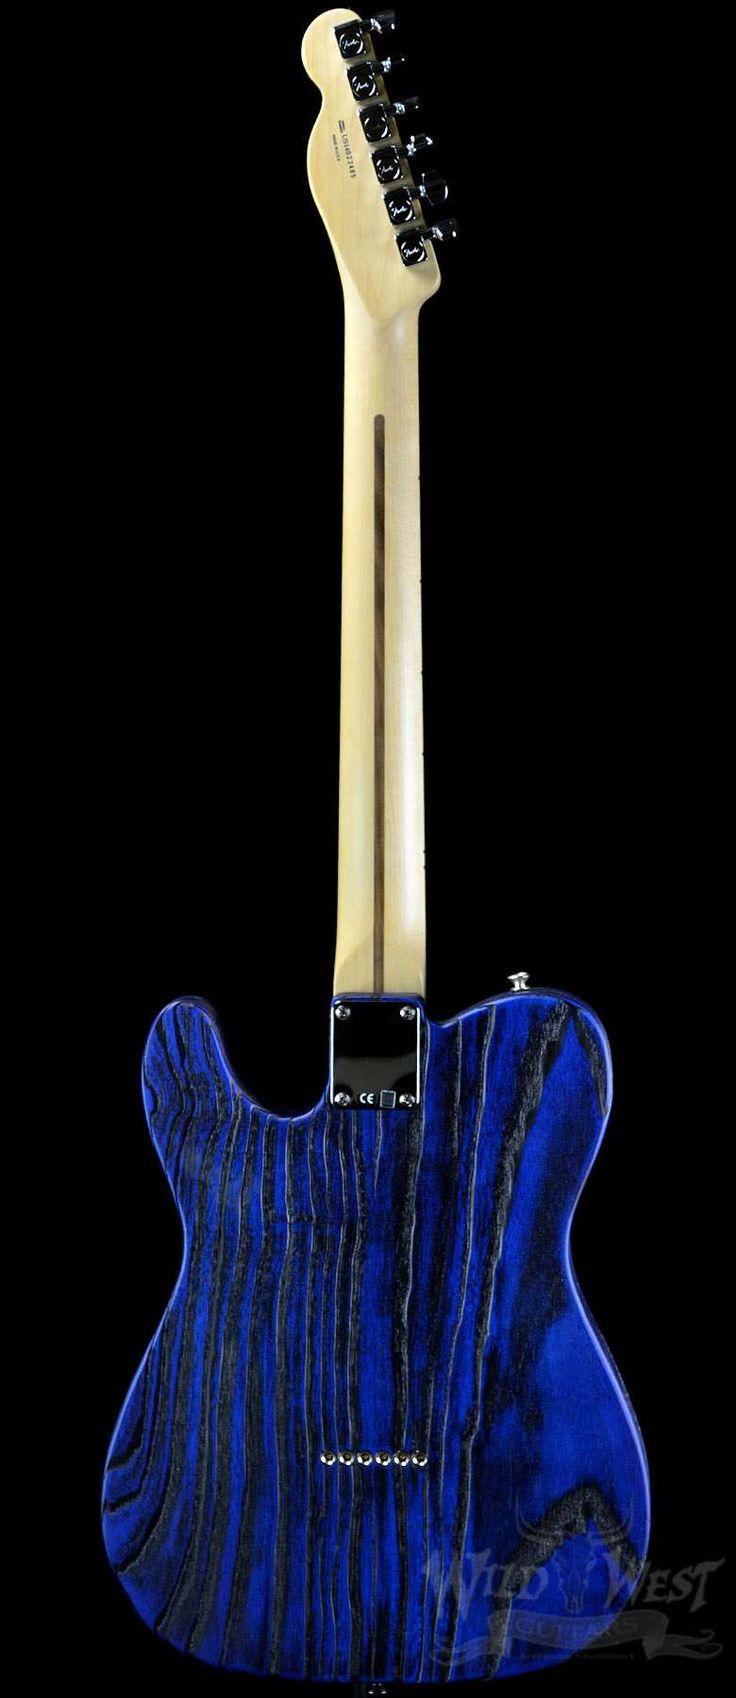 Fender USA Limited Edition Sandblasted Telecaster Sapphire Blue Transparent